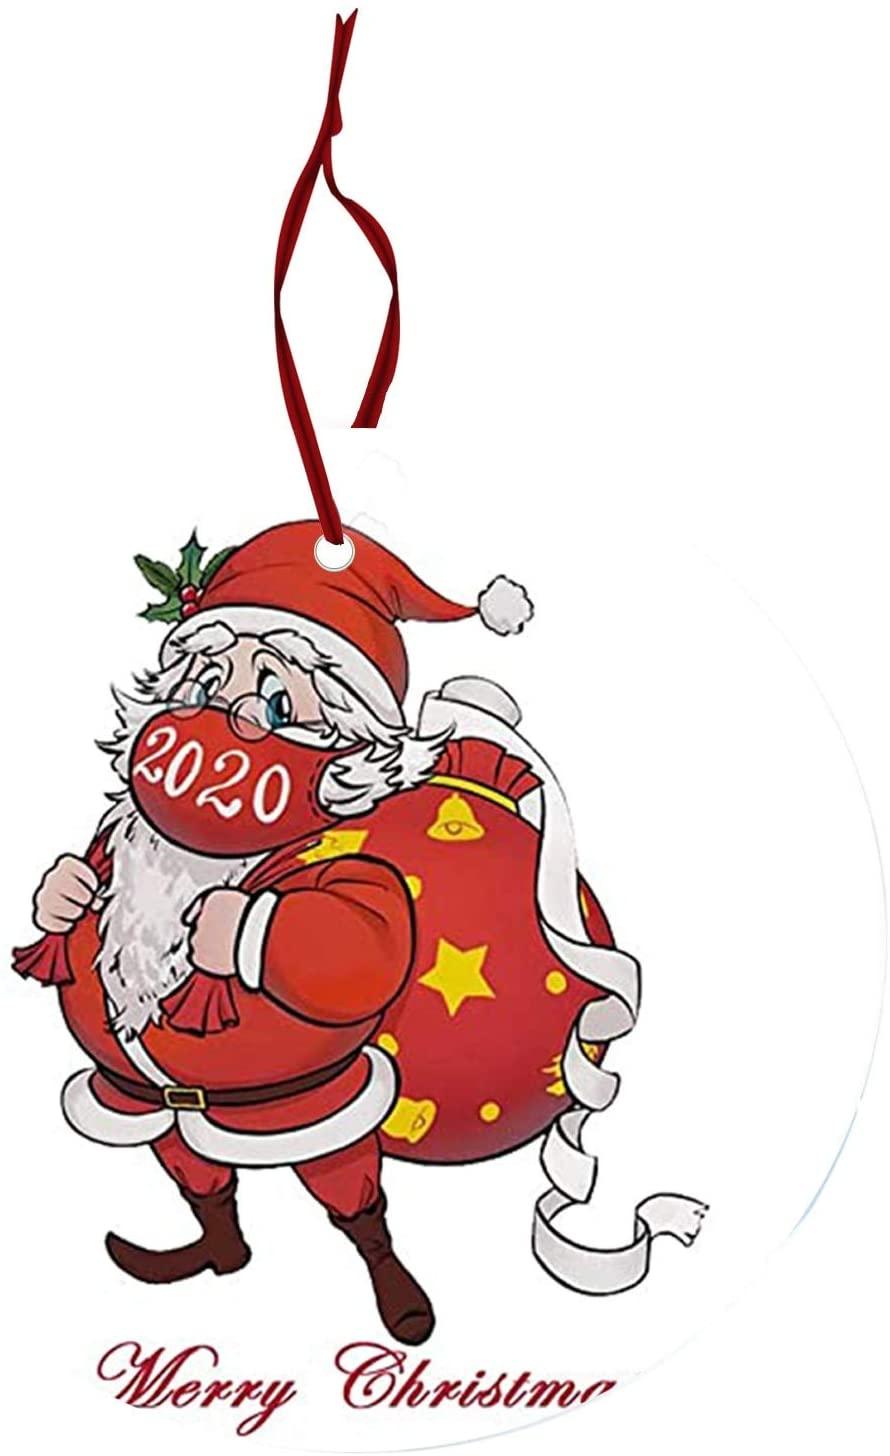 LebonYard 2020 Christmas Decorations with Masks 1PC Christmas Tree Ornaments Santa Claus Mask Souvenir Ornament Holiday Decor (I)